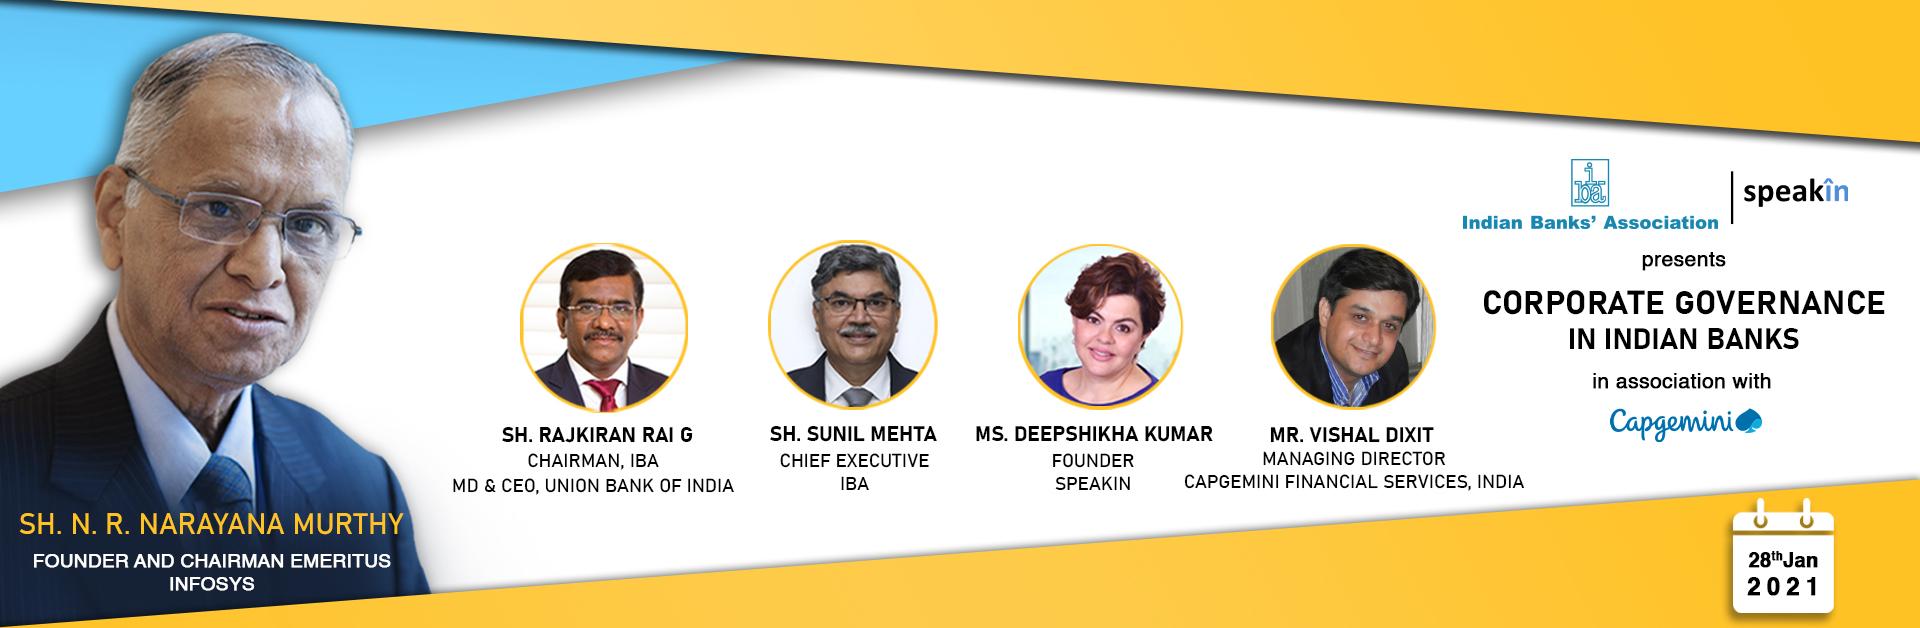 Corporate Governance in Indian Banks - Sh. N.R. Narayana Murthy